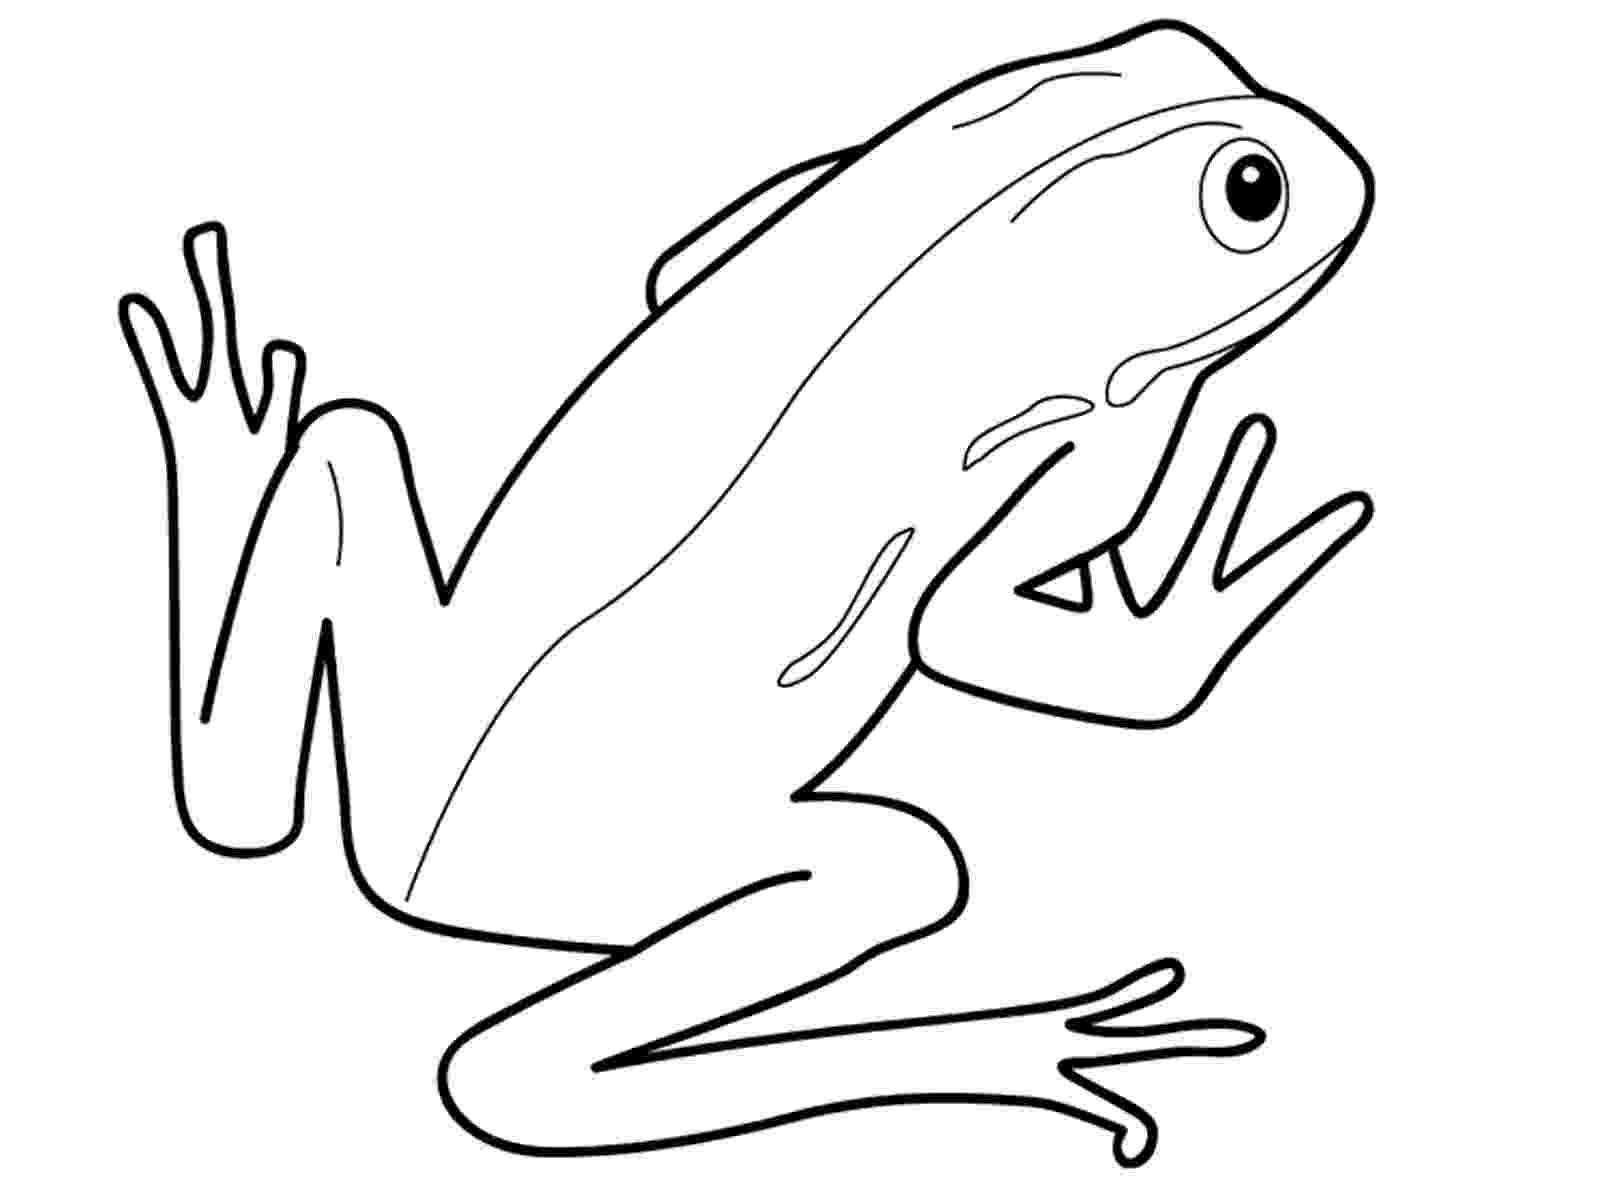 amphibian coloring pages amphibian coloring pages cswd pages coloring amphibian